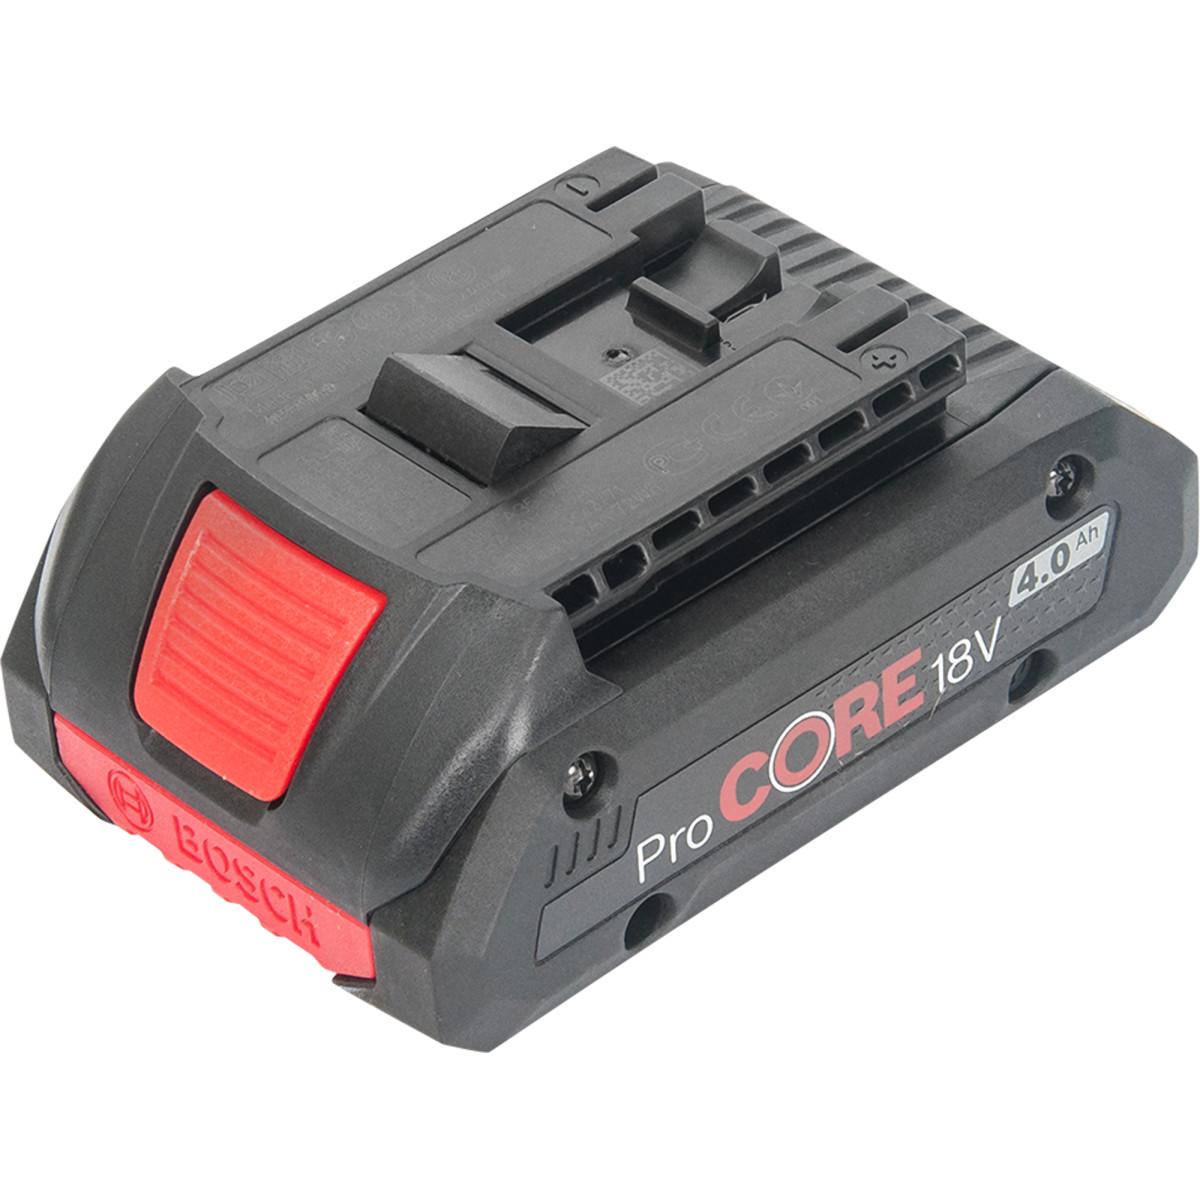 Аккумулятор Bosch Procore18V 18 В Li-ion 4 Ач